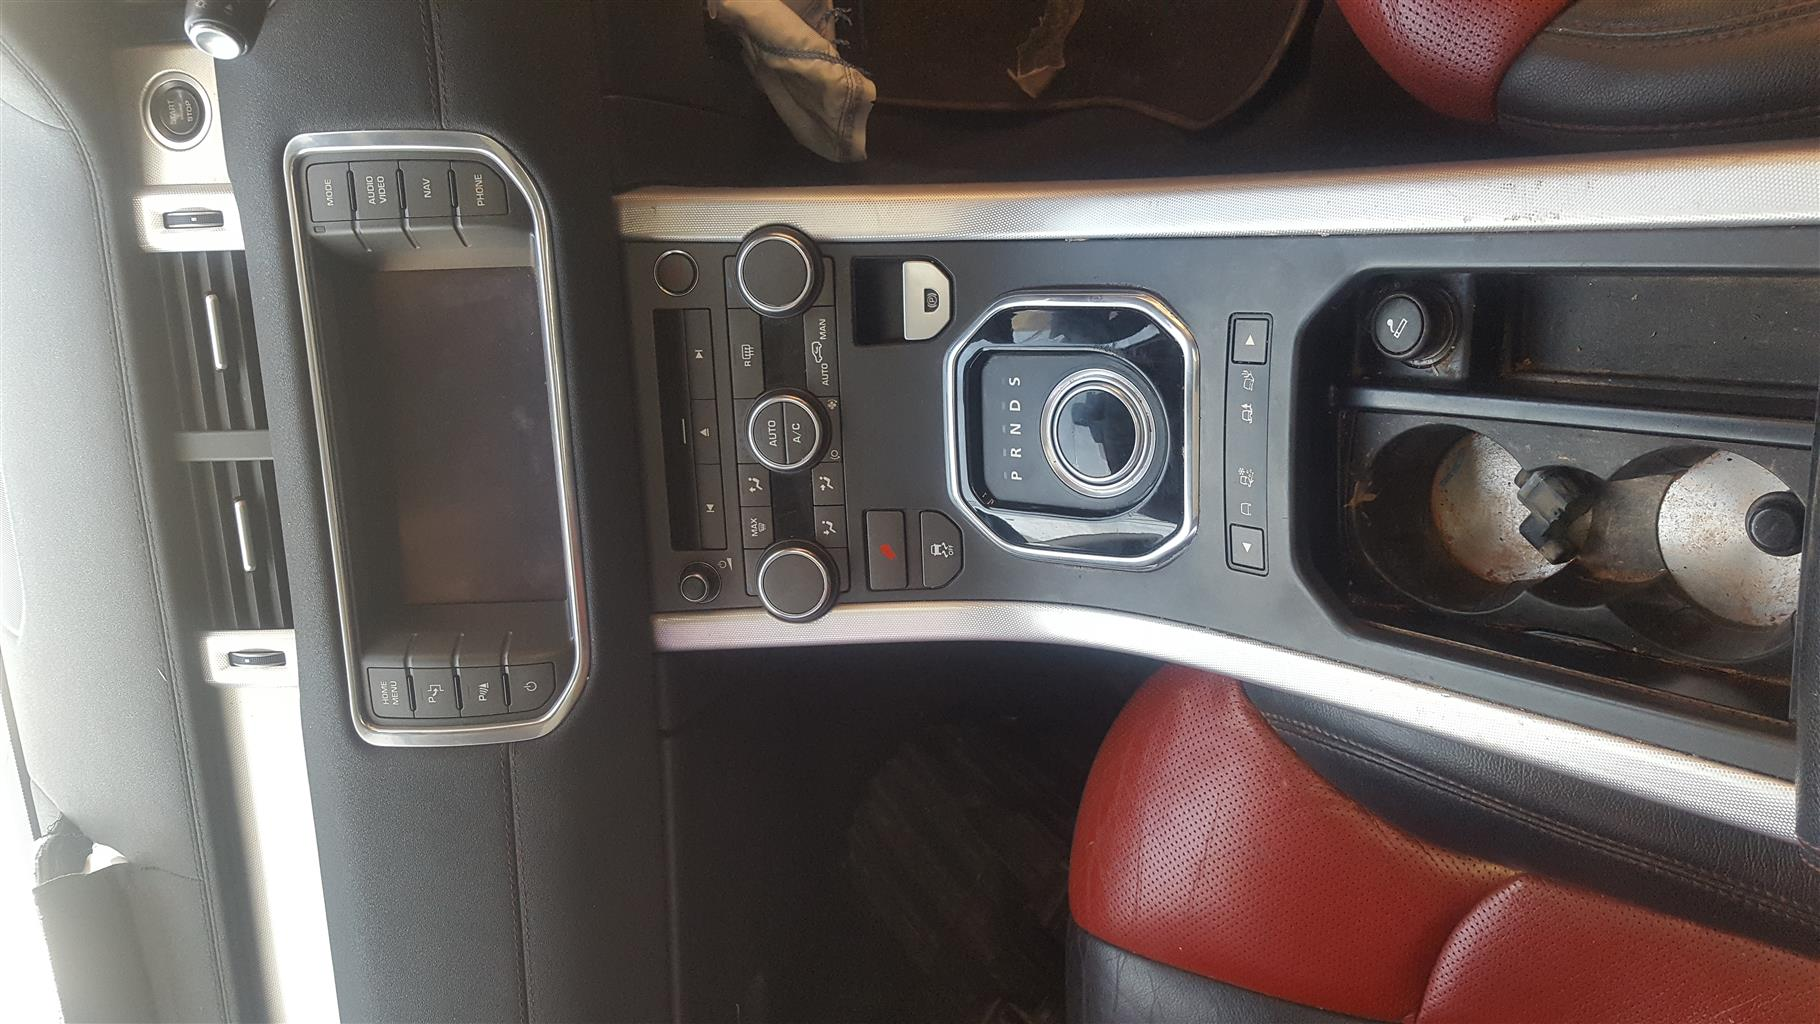 2013 Range Rover Evoque Satnav/ Radio for sale